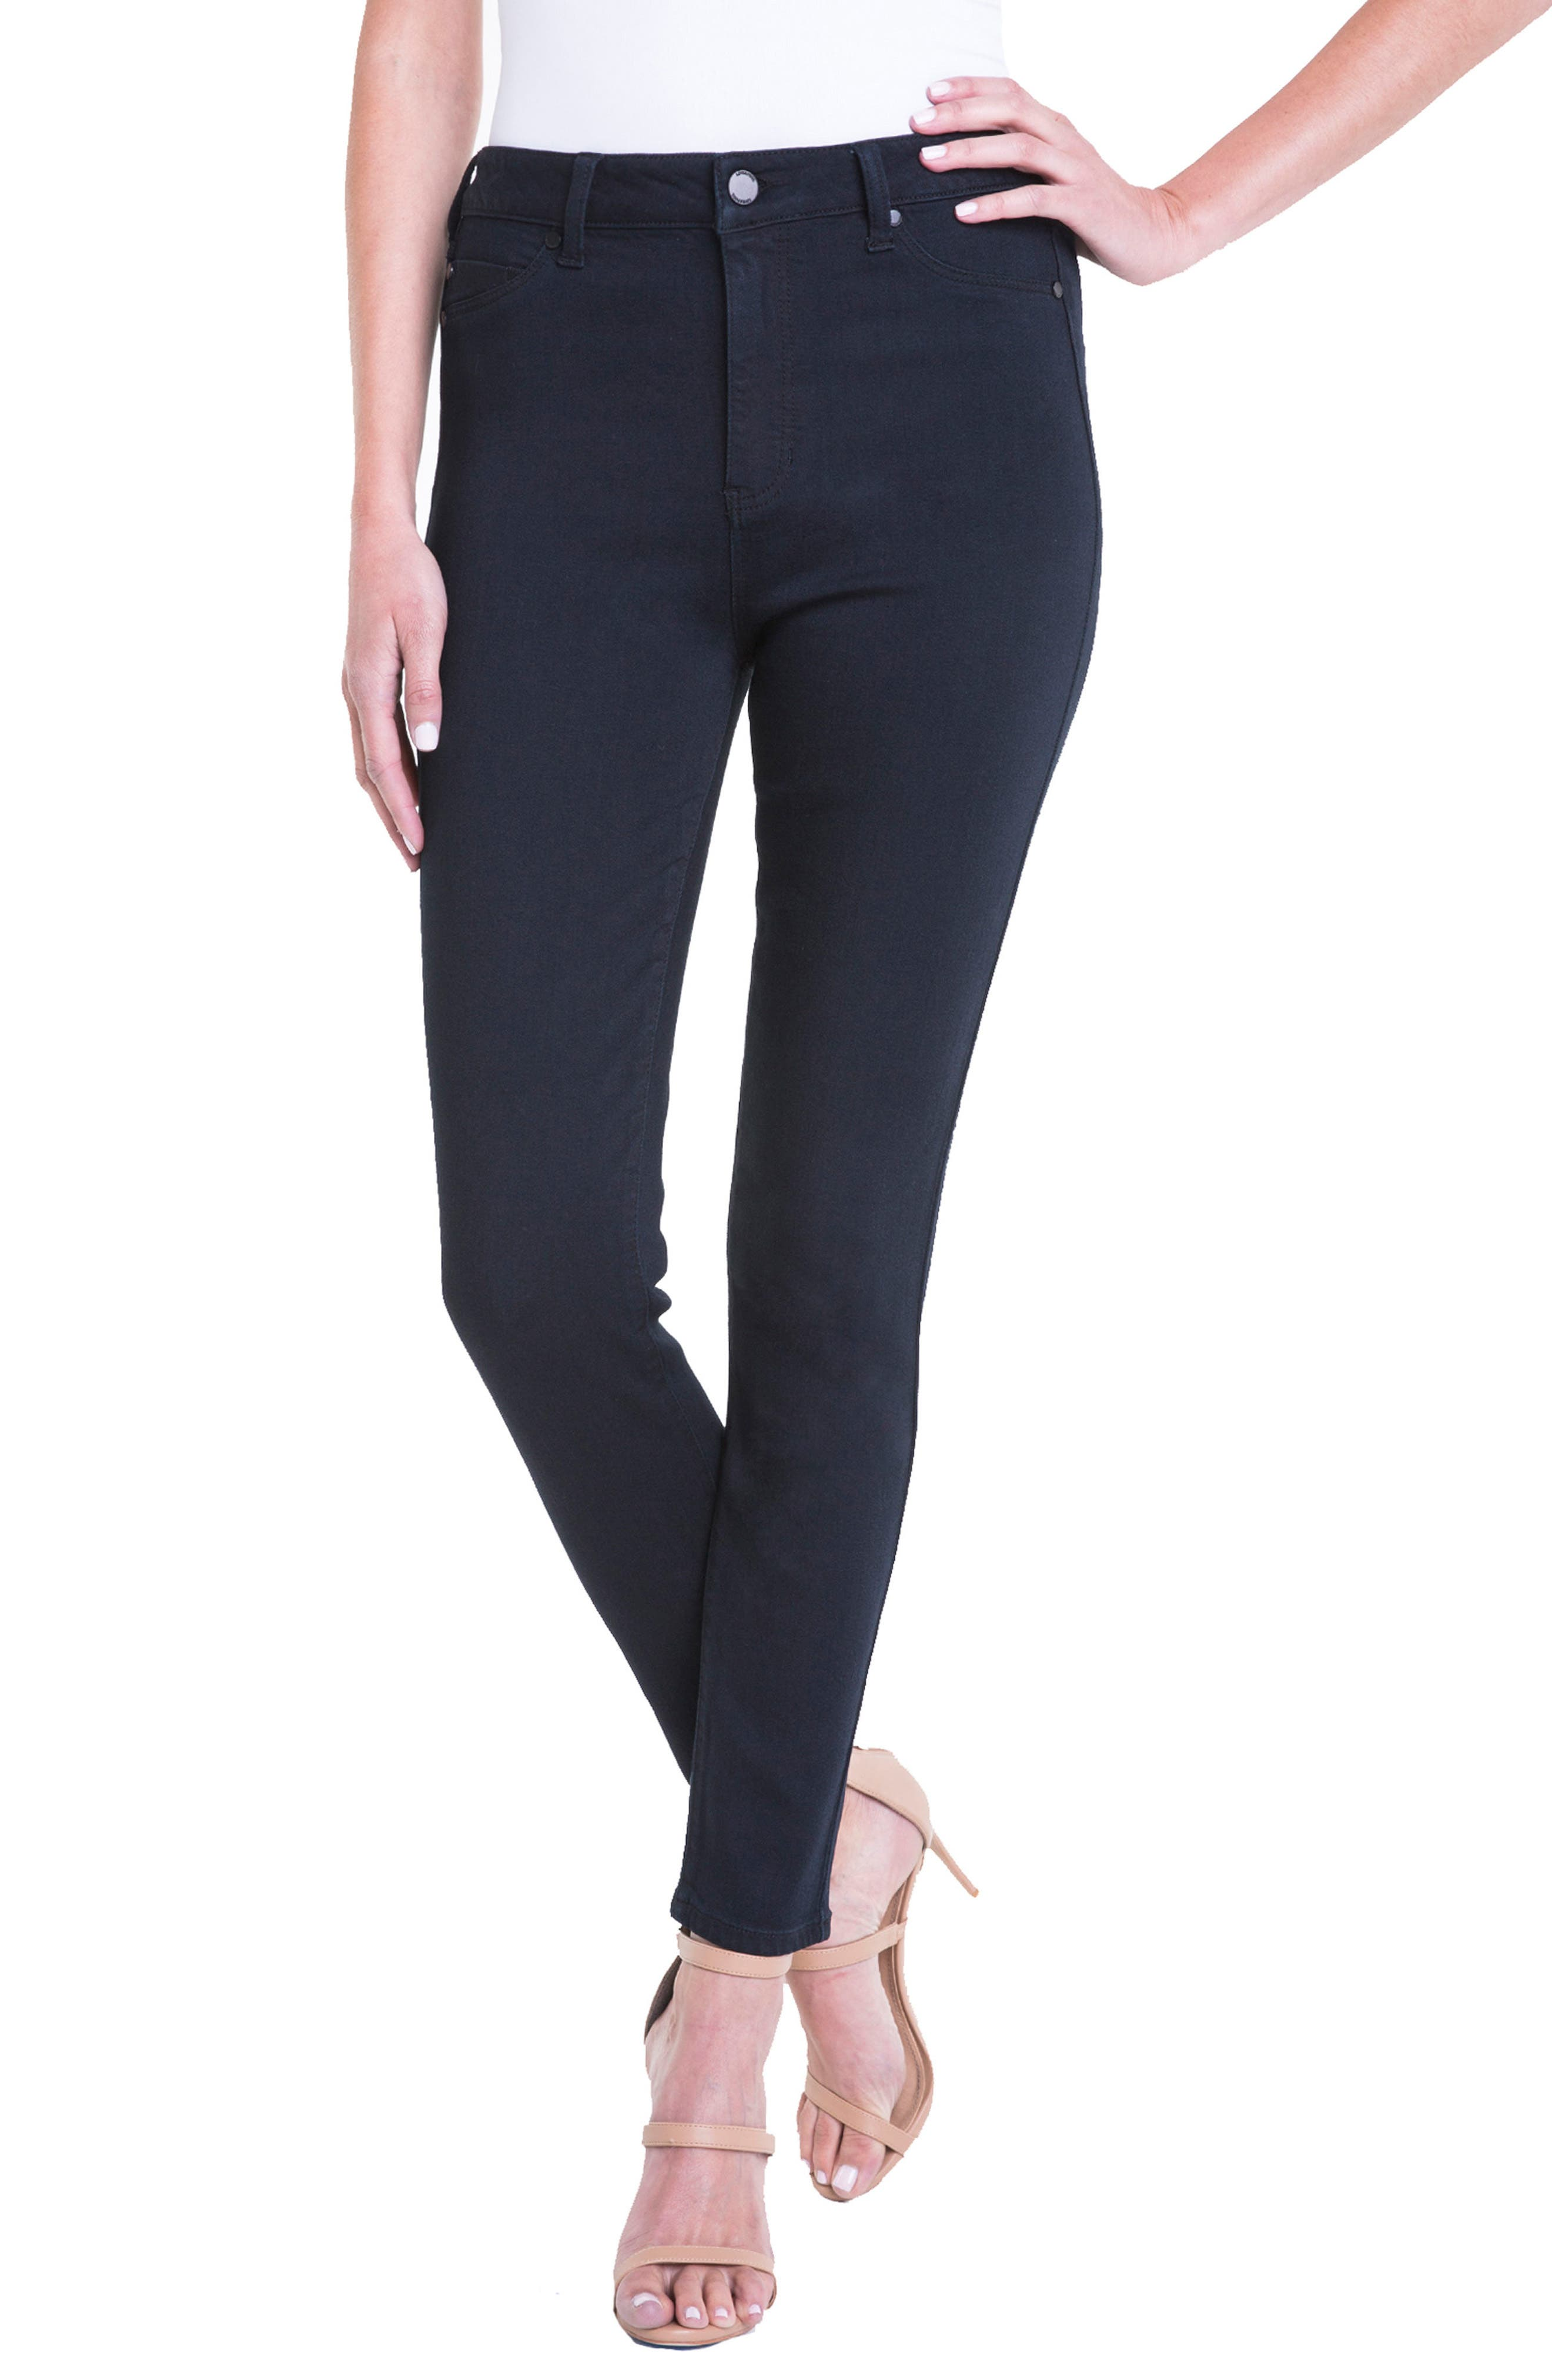 Jeans Company Bridget High Waist Skinny Jeans,                         Main,                         color, Indigo Over Dye Black